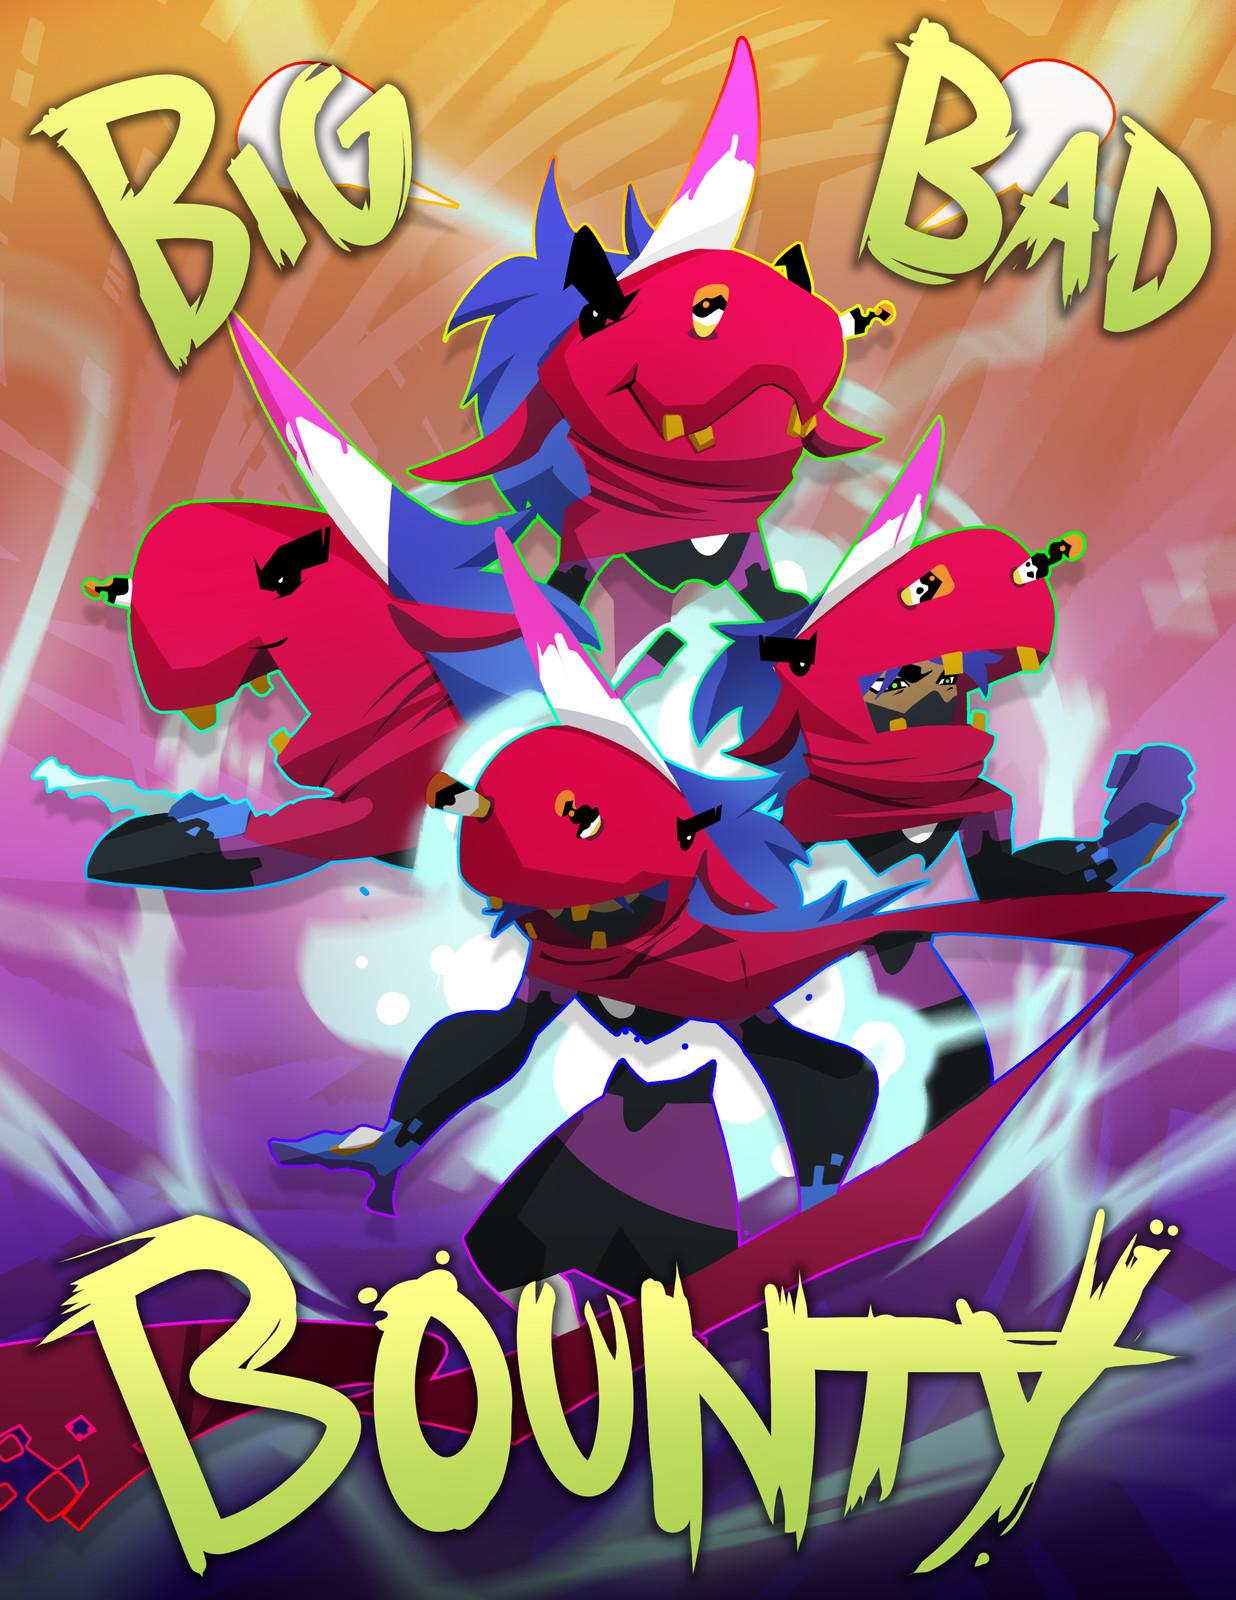 Big Bad Bounty Promo Piece